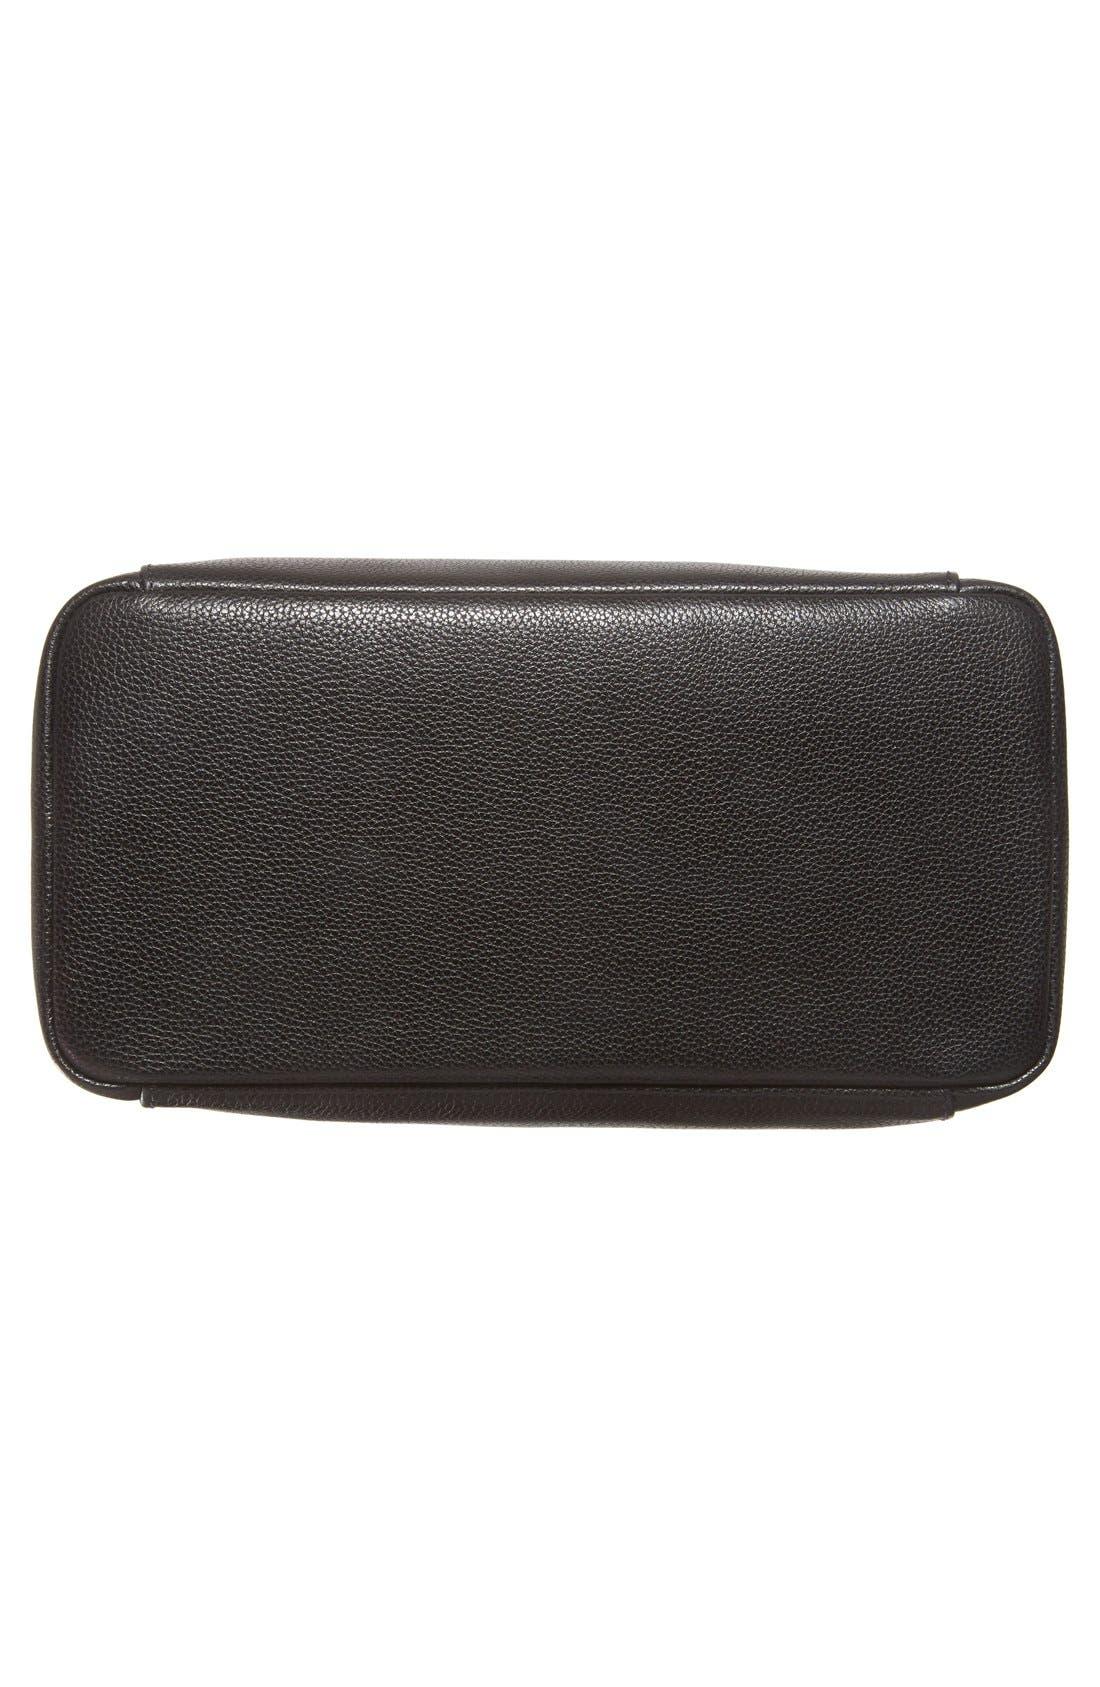 'Le Foulonne' Leather Hobo Bag,                             Alternate thumbnail 6, color,                             BLACK